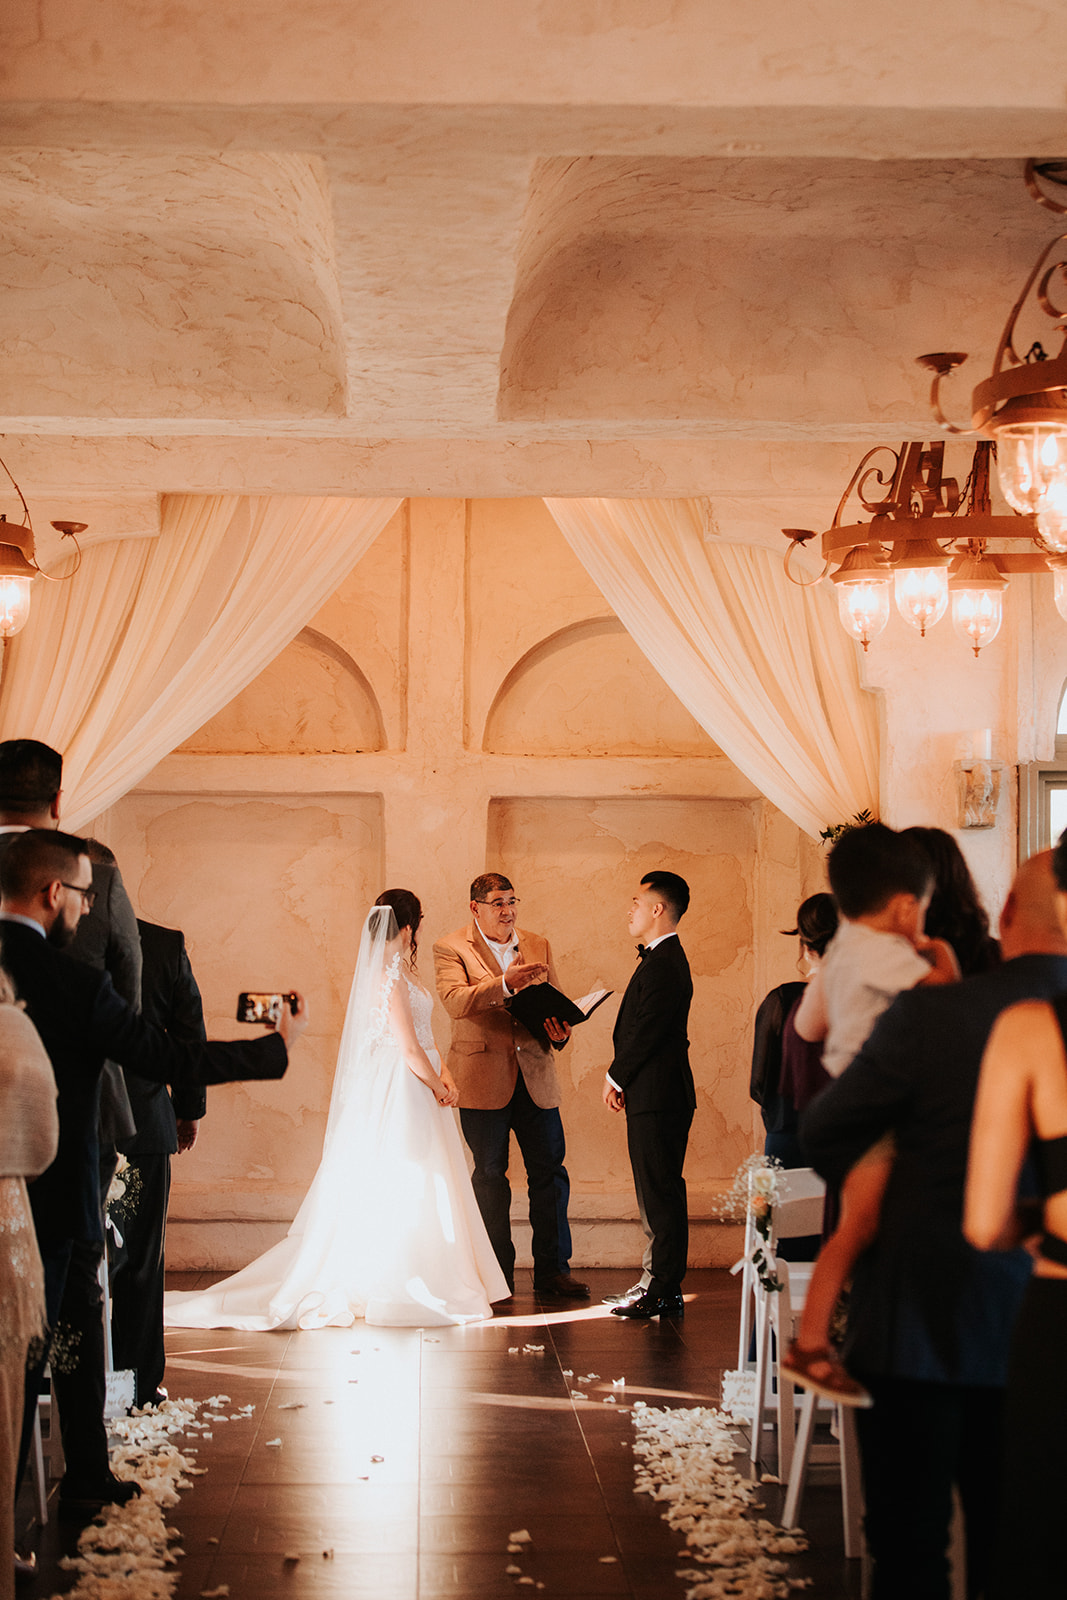 Jessica_+_JD_Wedding_-_Diana_Ascarrunz_Photography-411.jpg